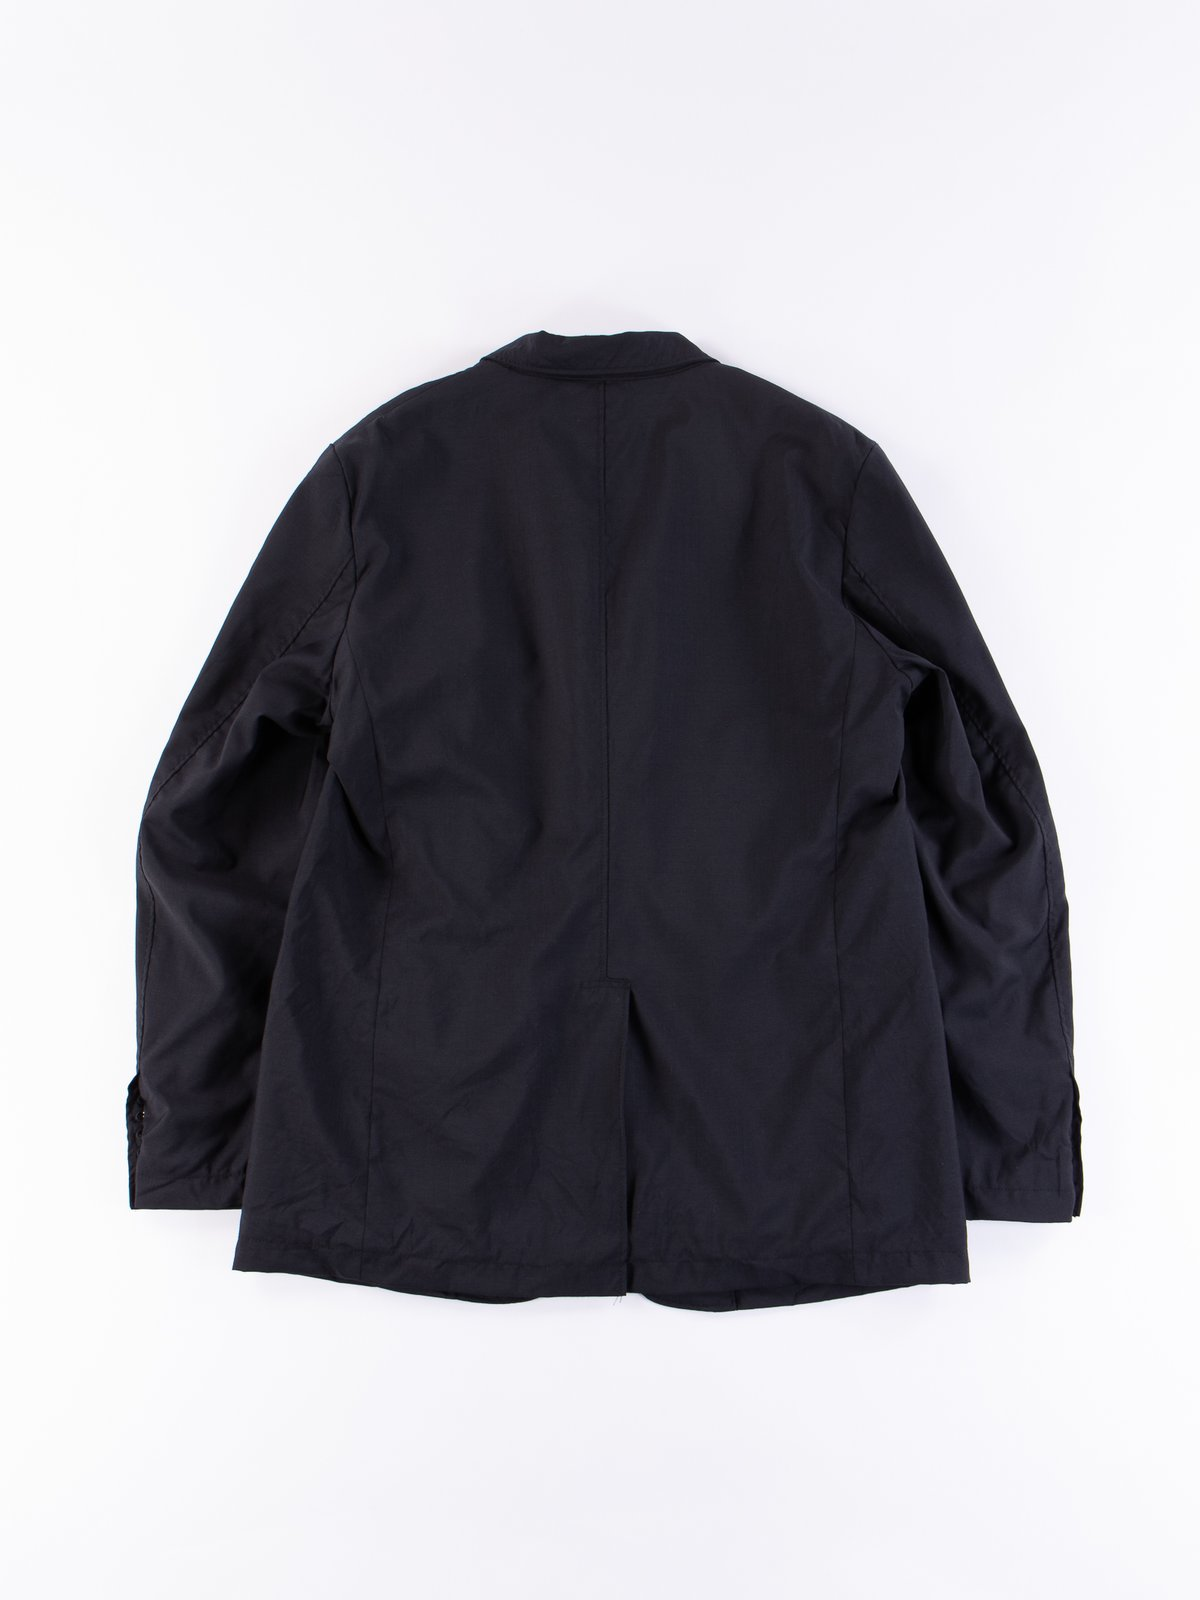 Dark Navy Tropical Wool Andover Jacket - Image 5